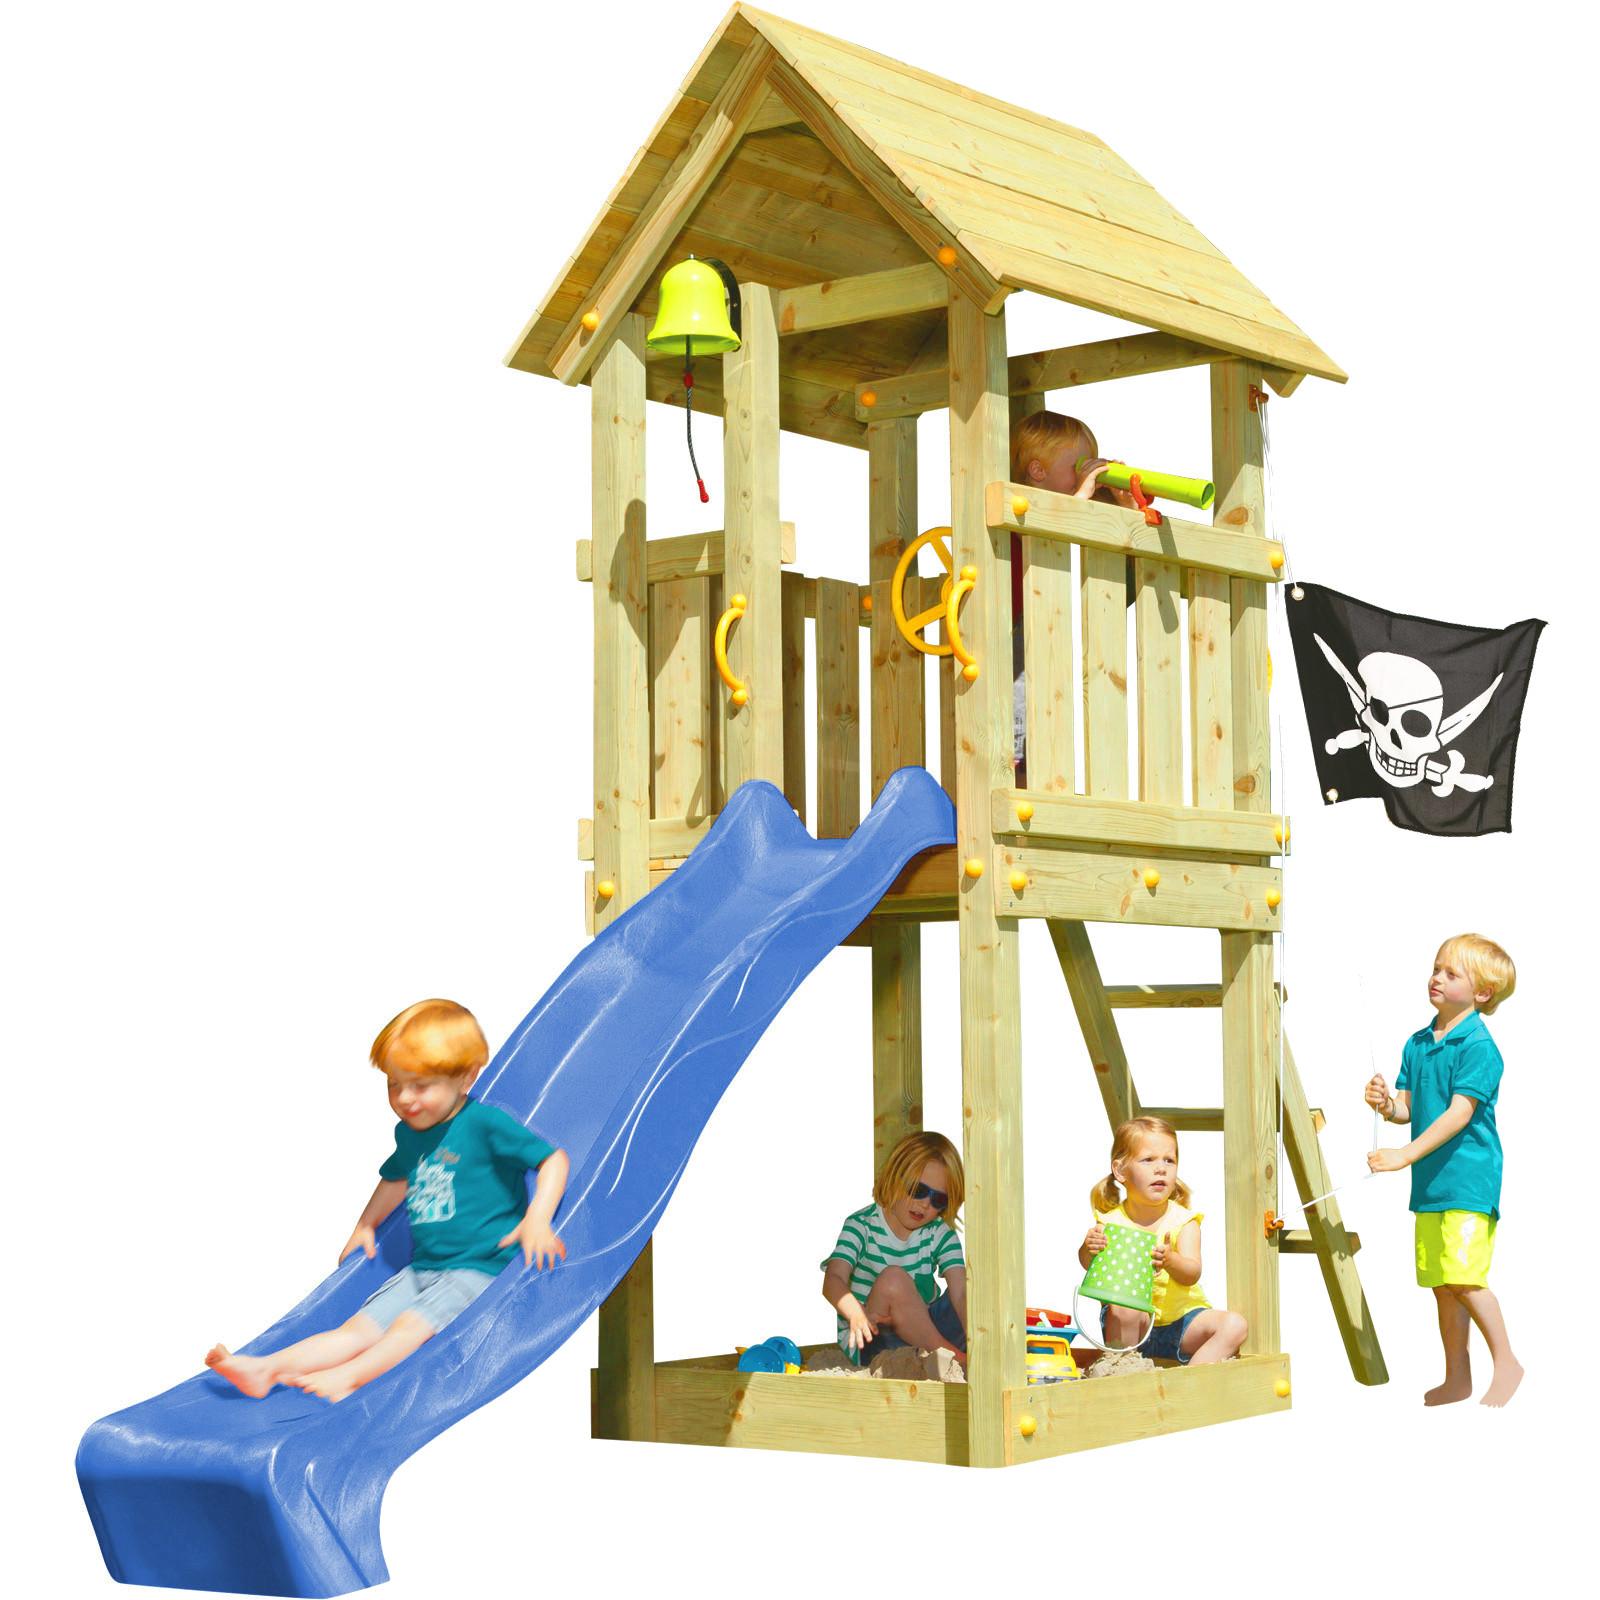 blue rabbit spielturm kiosk mit rutsche kletterturm sandkasten lenkrad flagge ebay. Black Bedroom Furniture Sets. Home Design Ideas